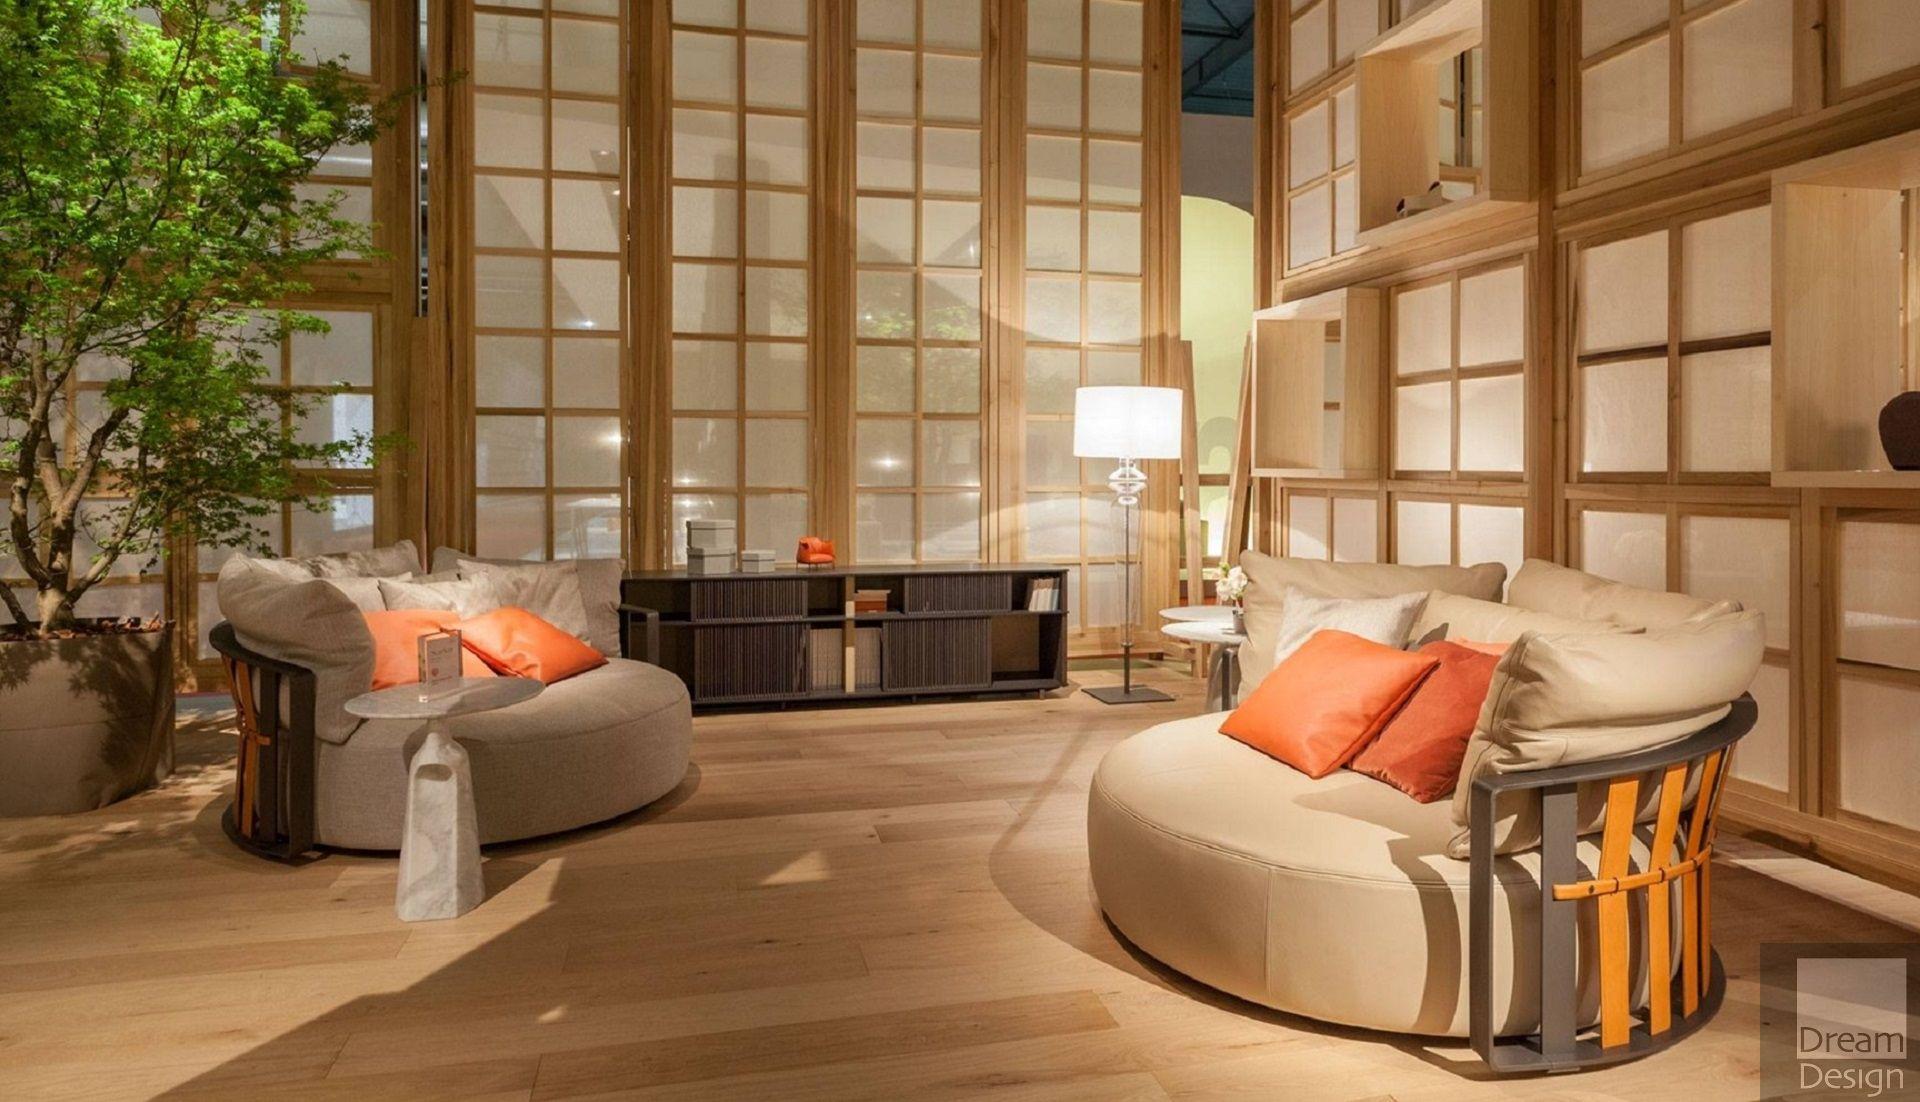 Poltrona frau scarlett sofa by jean marie massaud ebo for Poltronafrau